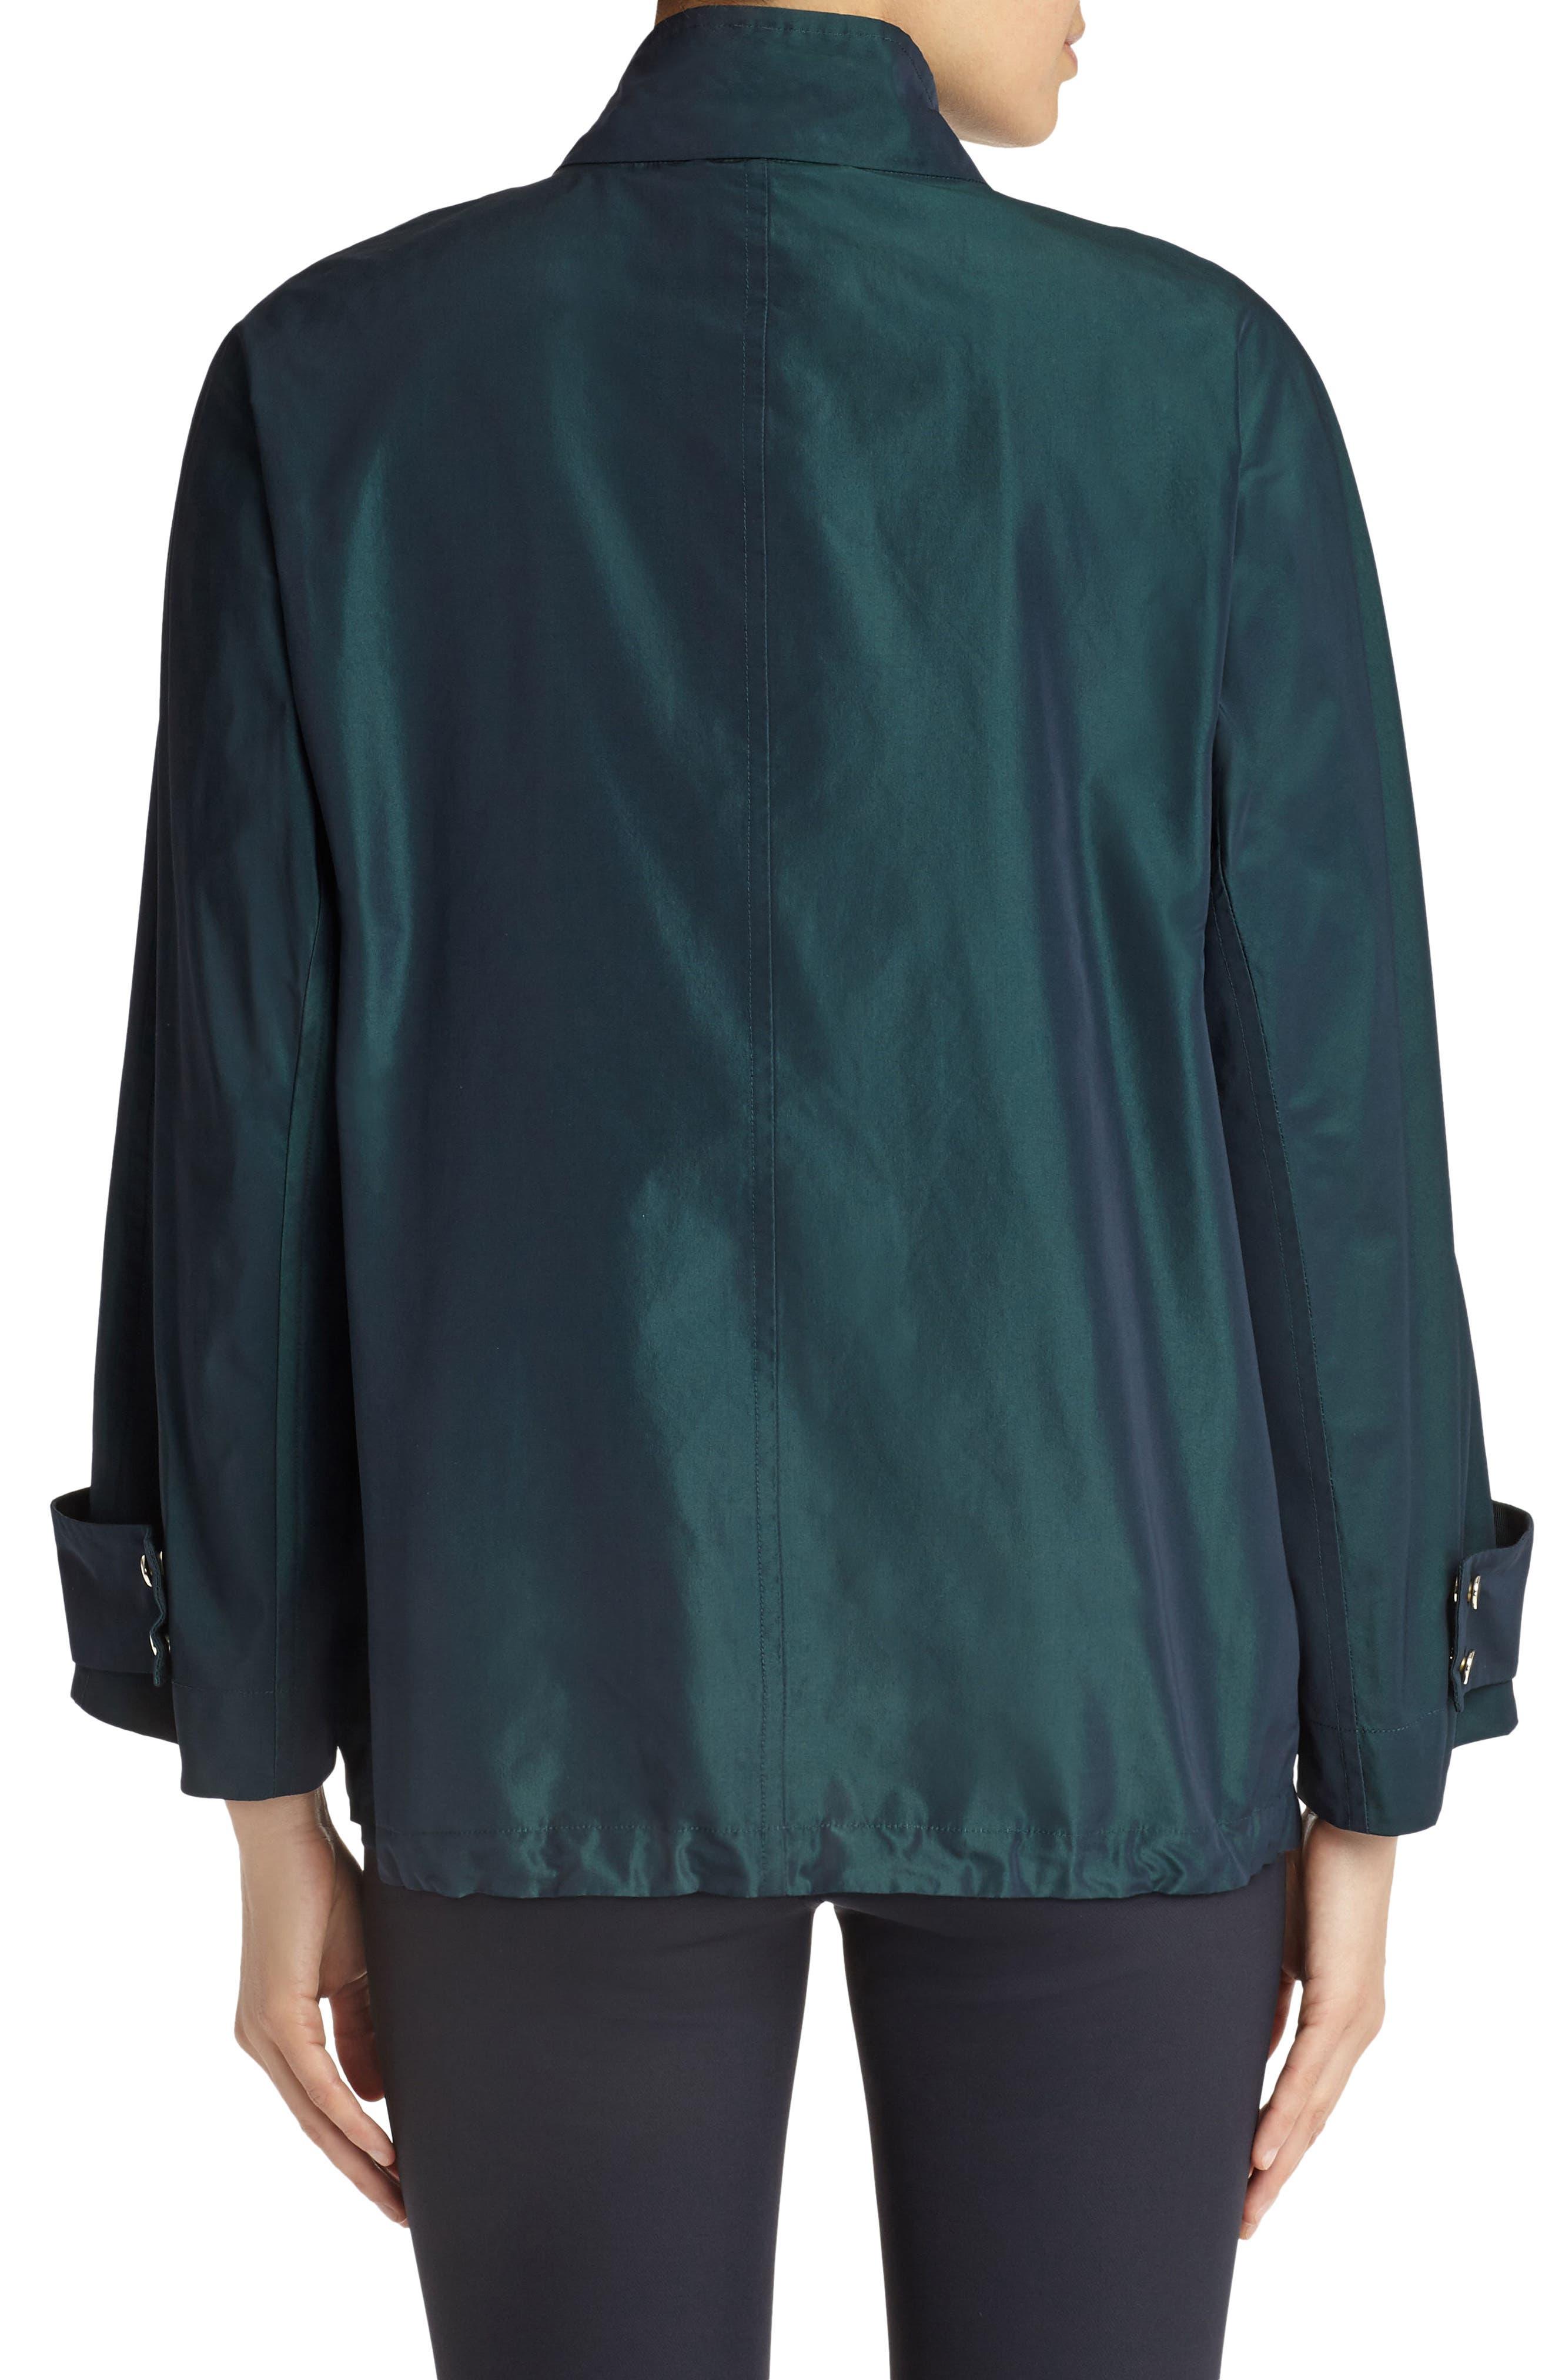 Markus Empirical Tech Cloth Jacket,                             Alternate thumbnail 2, color,                             Blue Spruce Iridescent